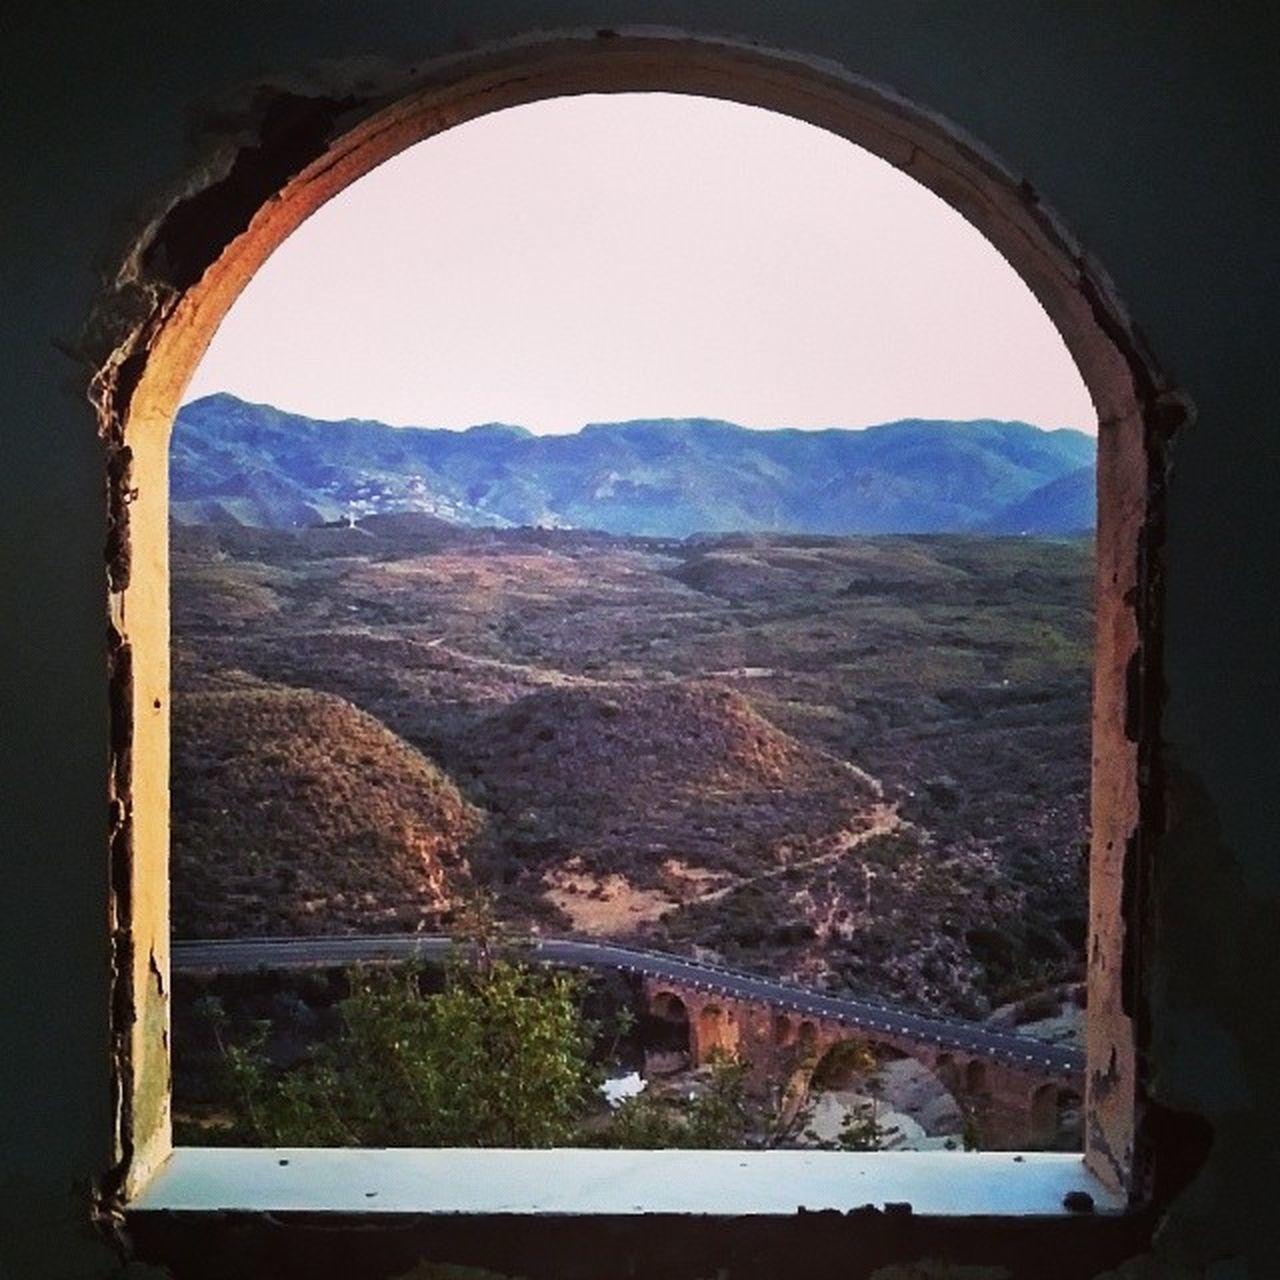 Windows Ventana